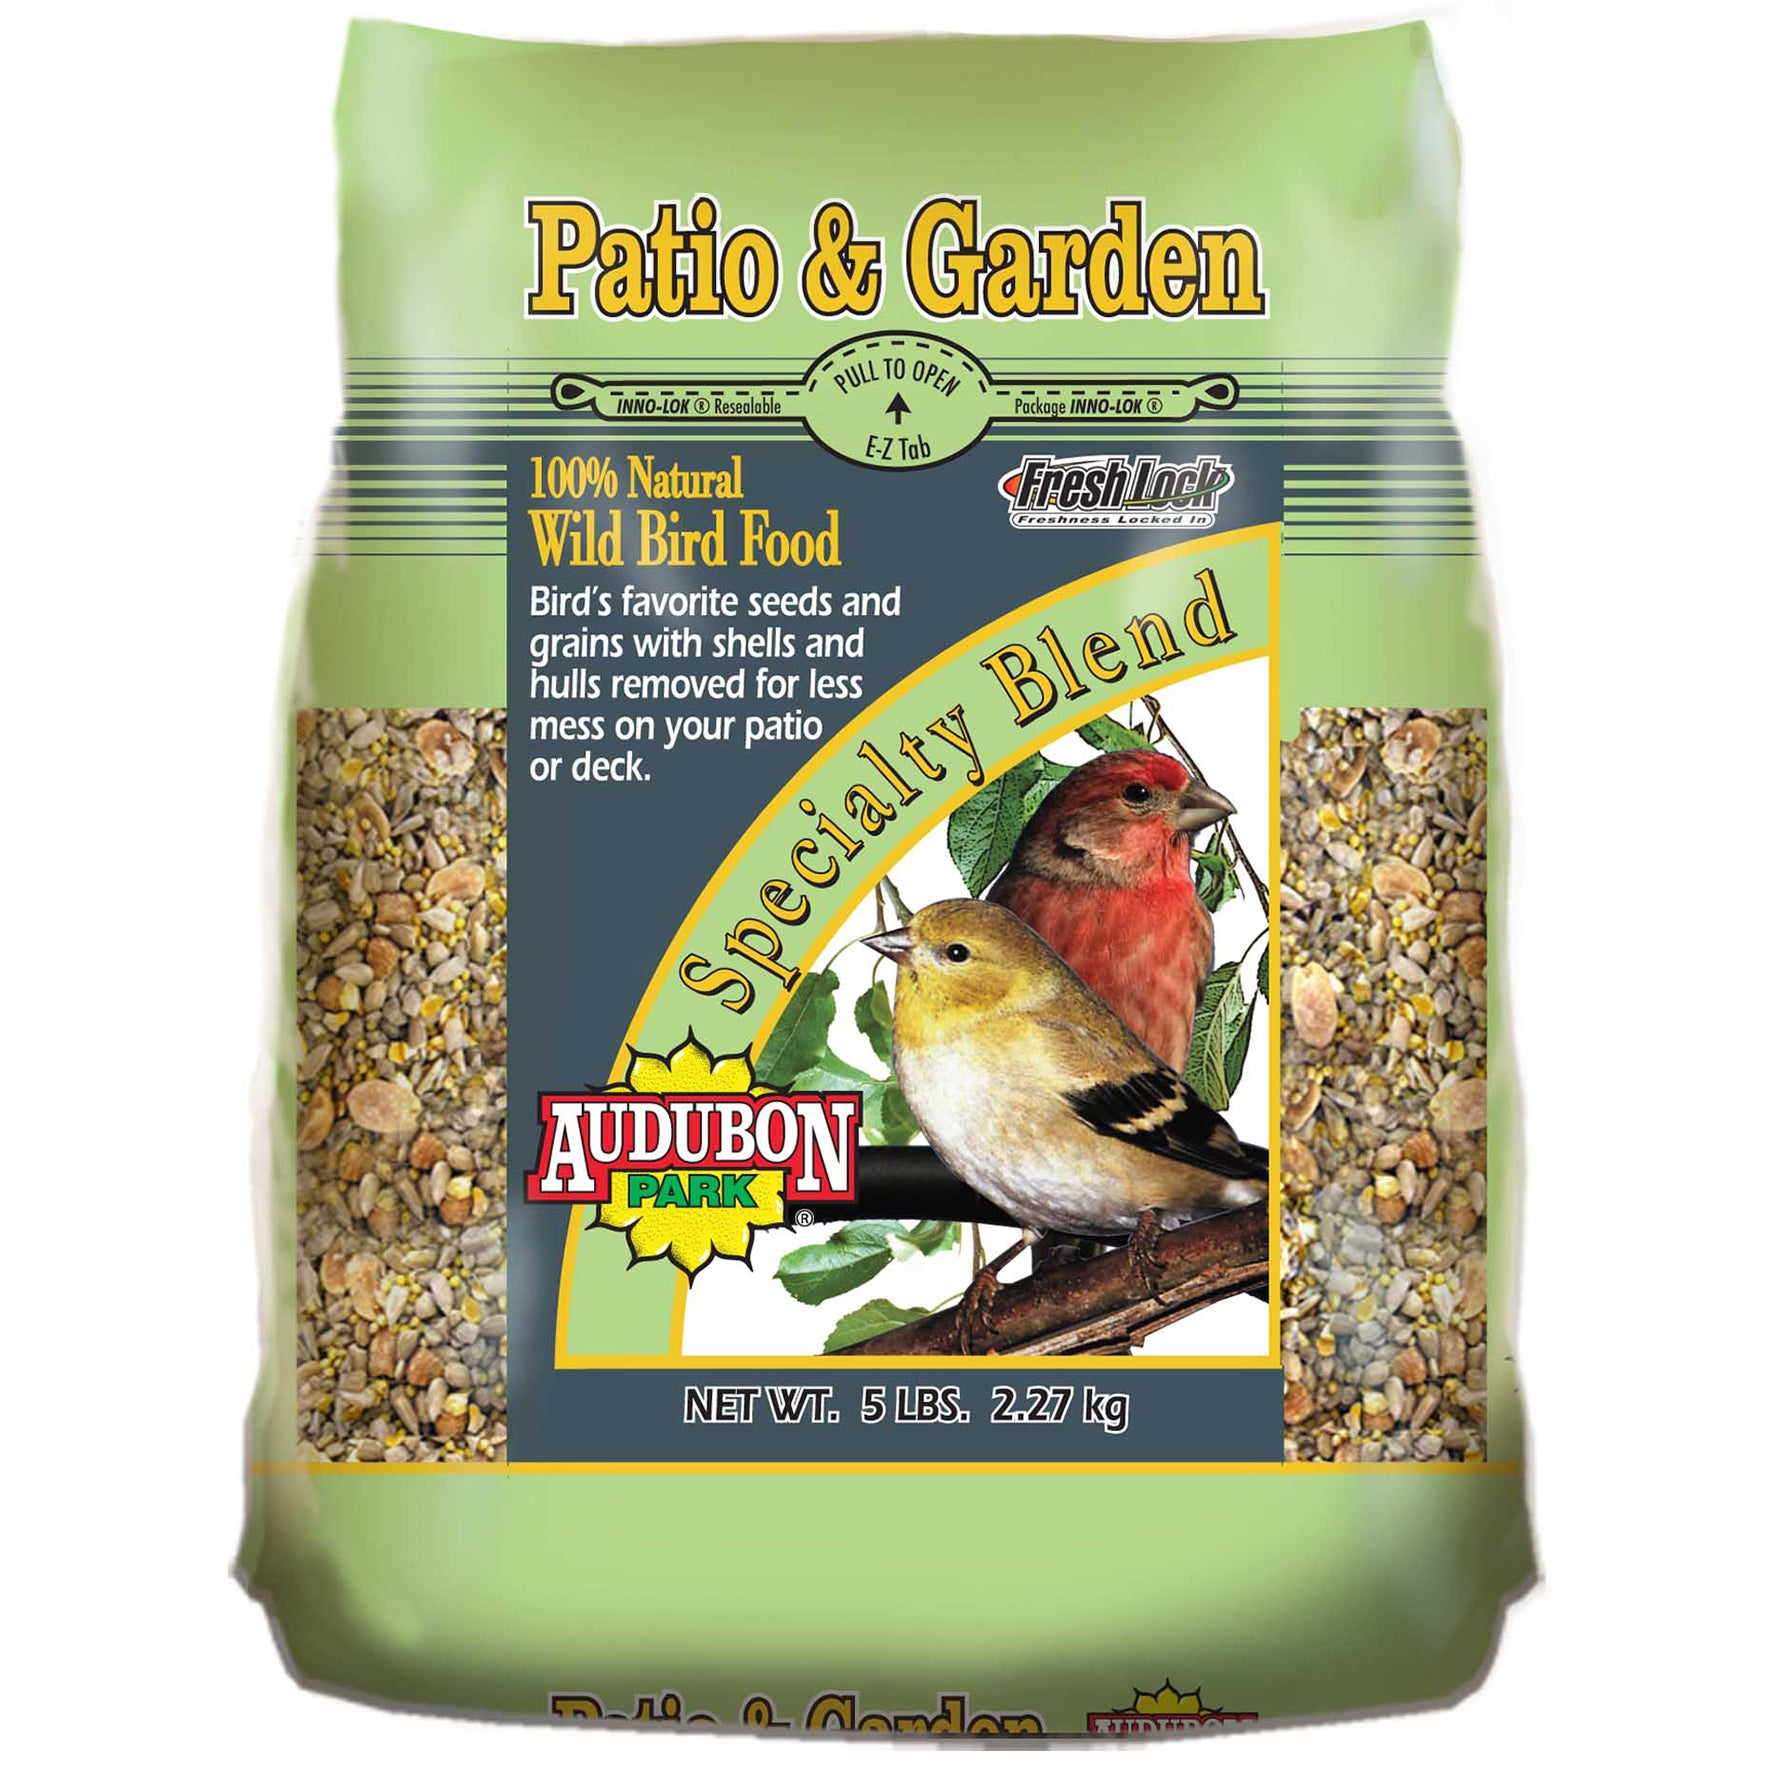 Audubon Park 5 lb Park Patio And Garden Wild Bird Food (5...